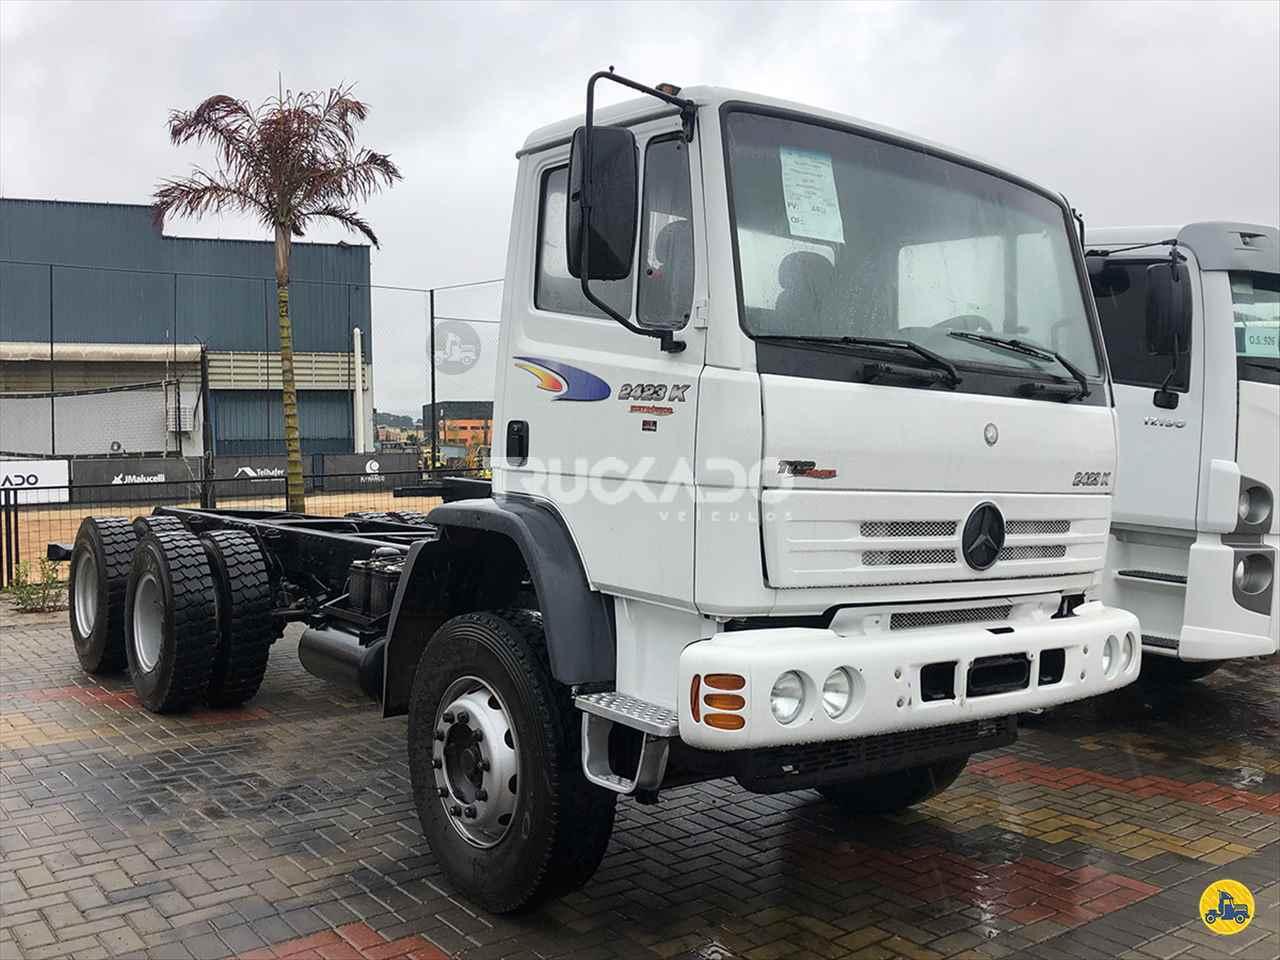 CAMINHAO MERCEDES-BENZ MB 2423 Chassis Truck 6x2 Truckado Veículos SINOP MATO GROSSO MT